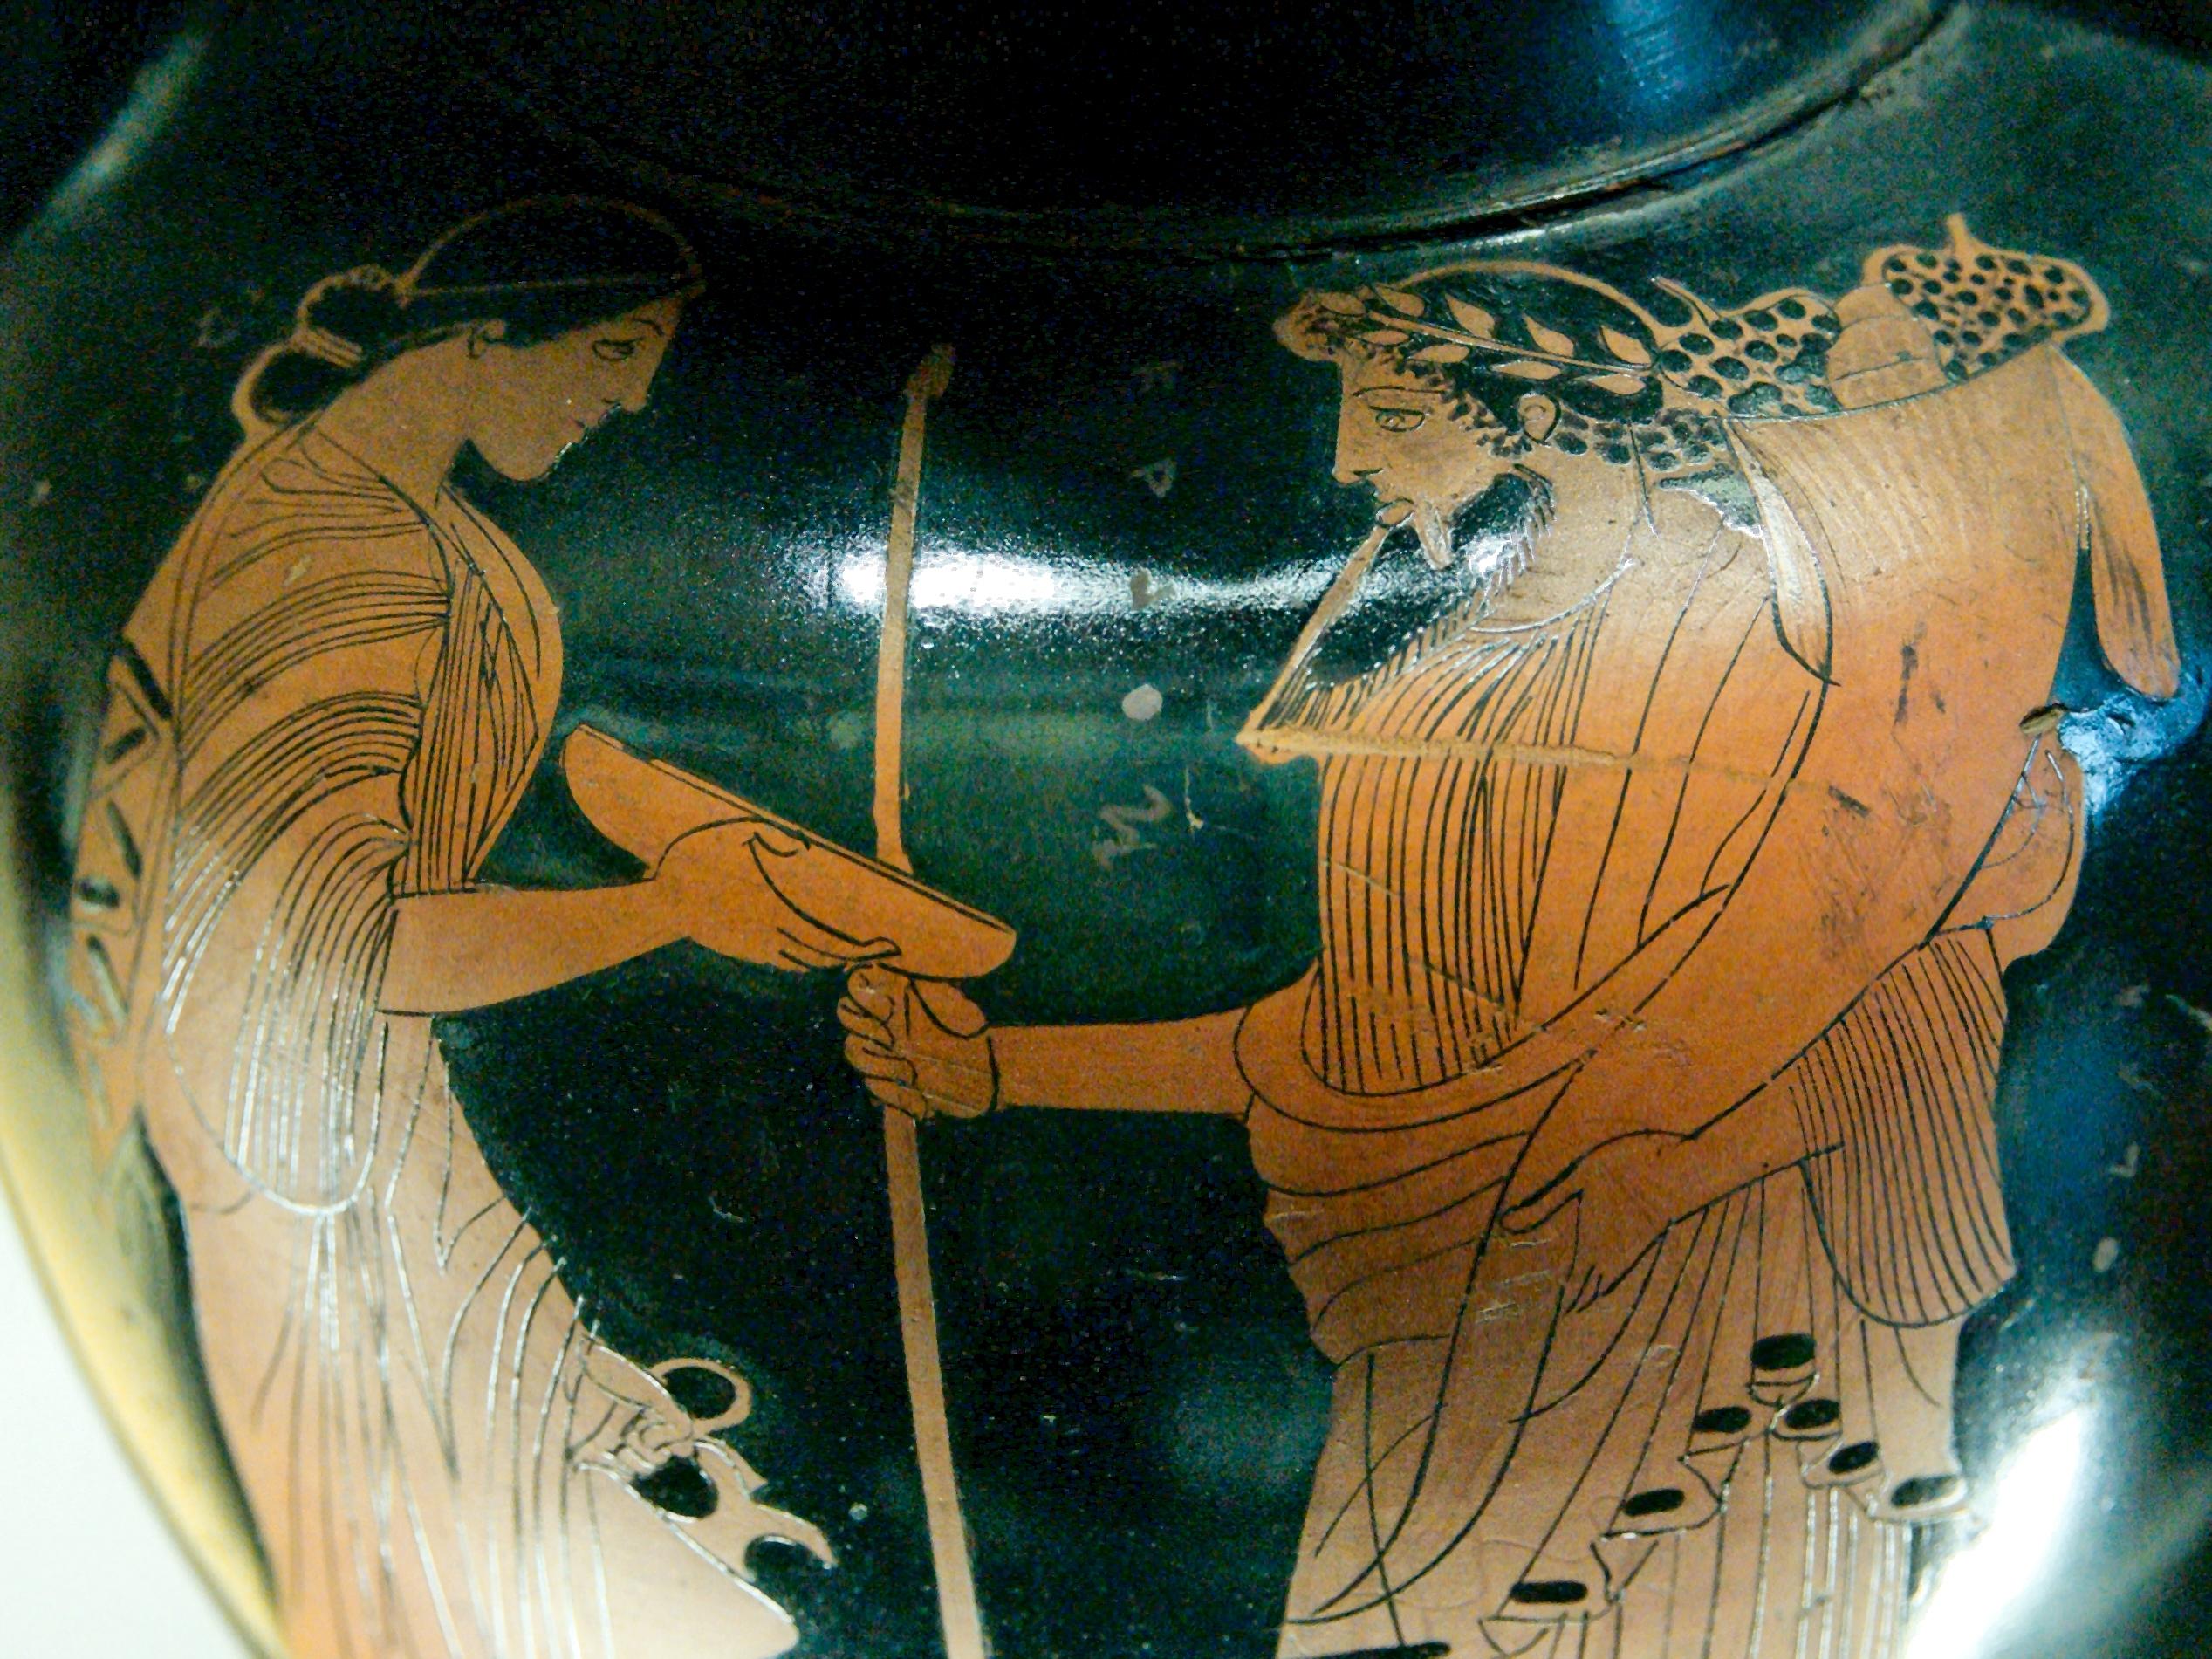 File:Amphora Hades Louvre G209 n2.jpg